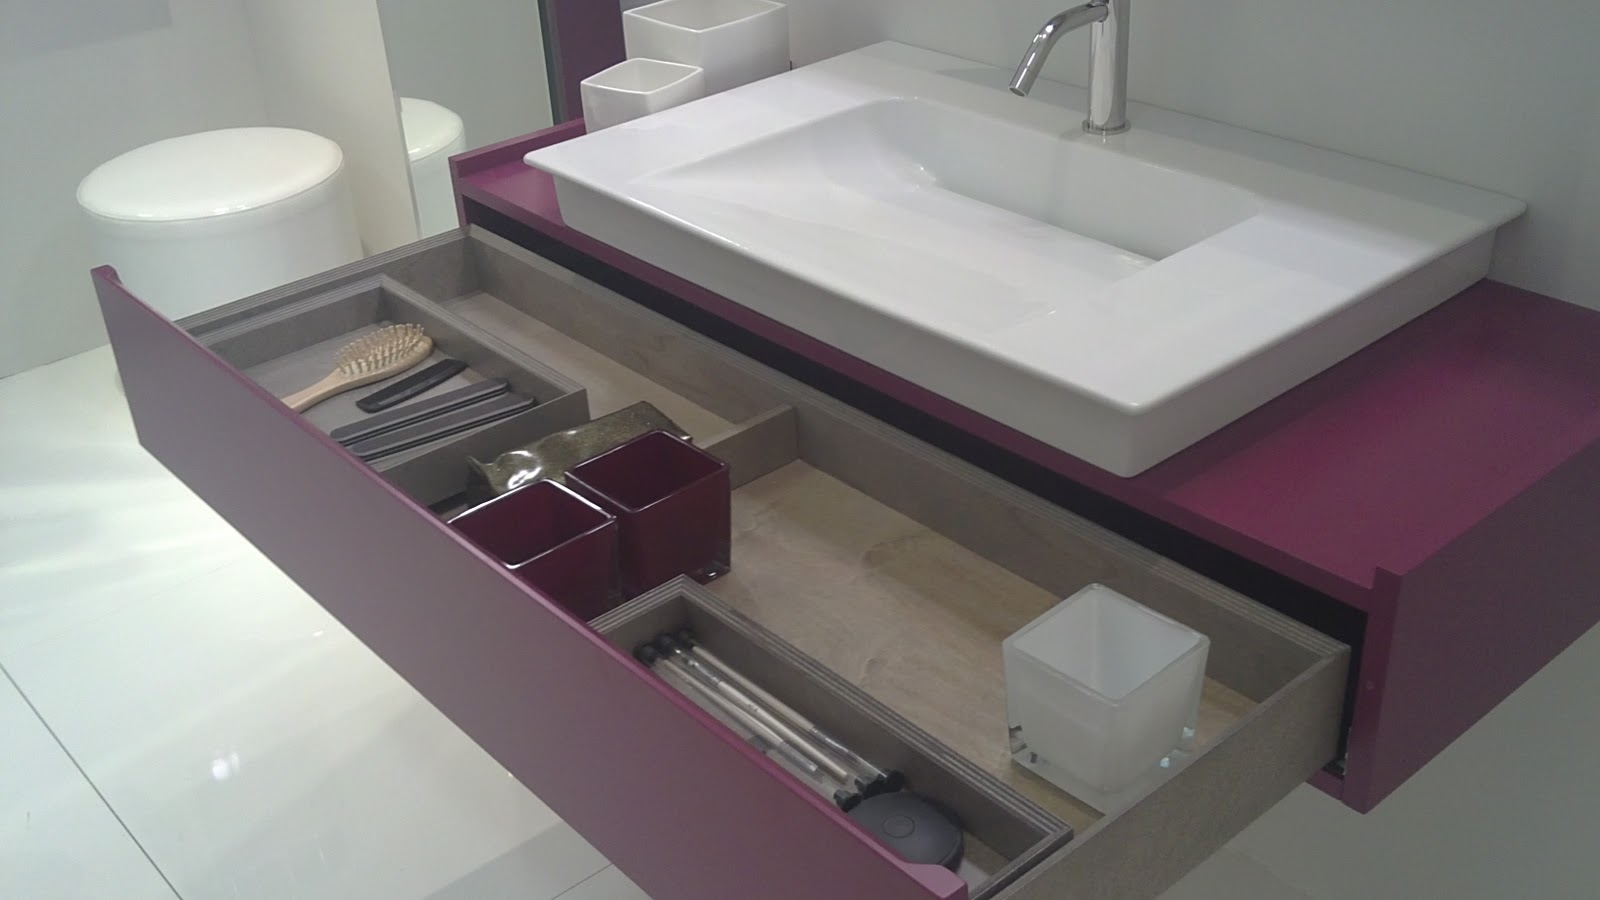 Luxe bath ba os decoraci n y estilo 09 01 2011 10 01 2011 for Mueble kansas